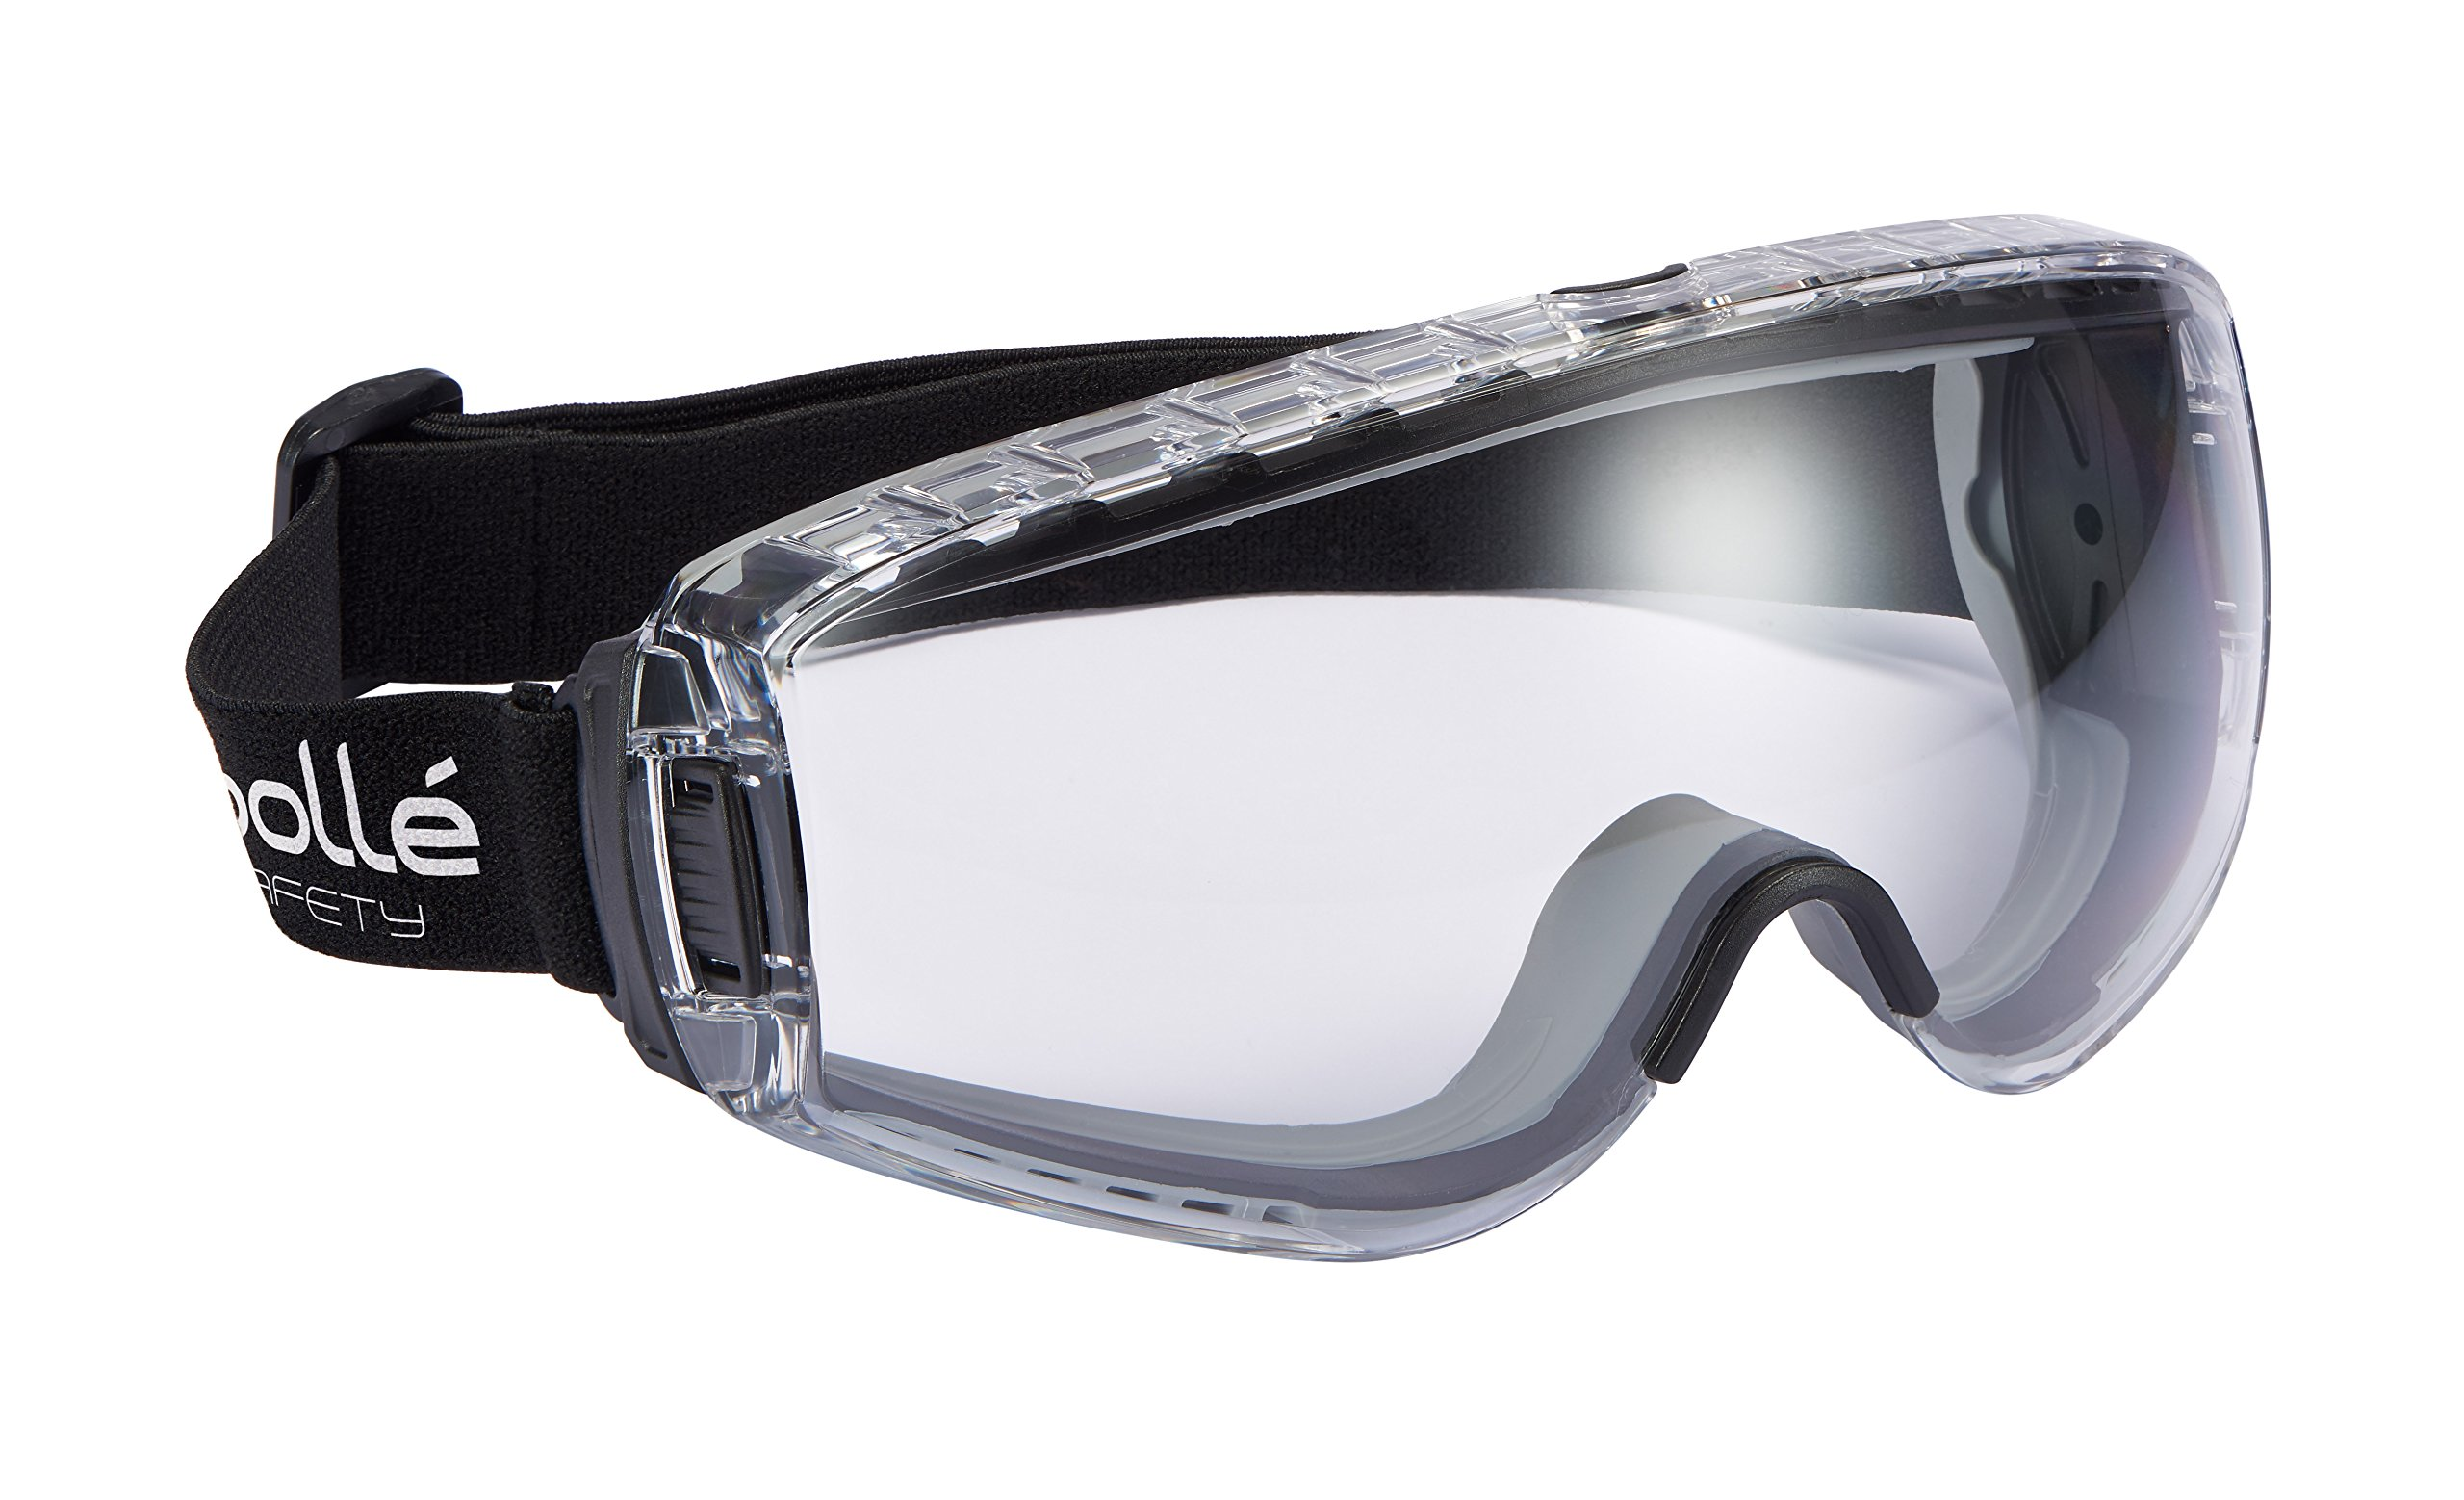 Bolle Safety PILOPSI Pilot - Gafas protectoras transparentes product image